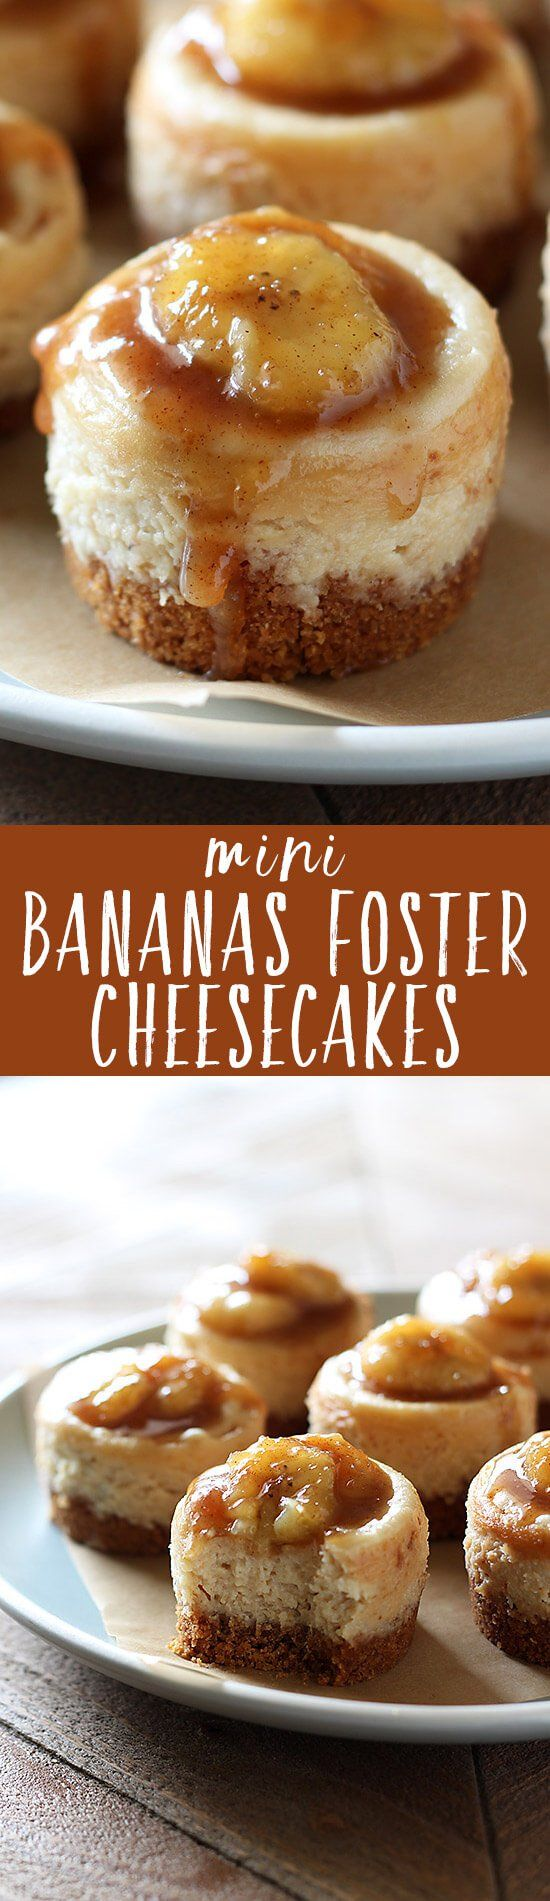 Mini Bananas Foster Cheesecakes - Handle the Heat